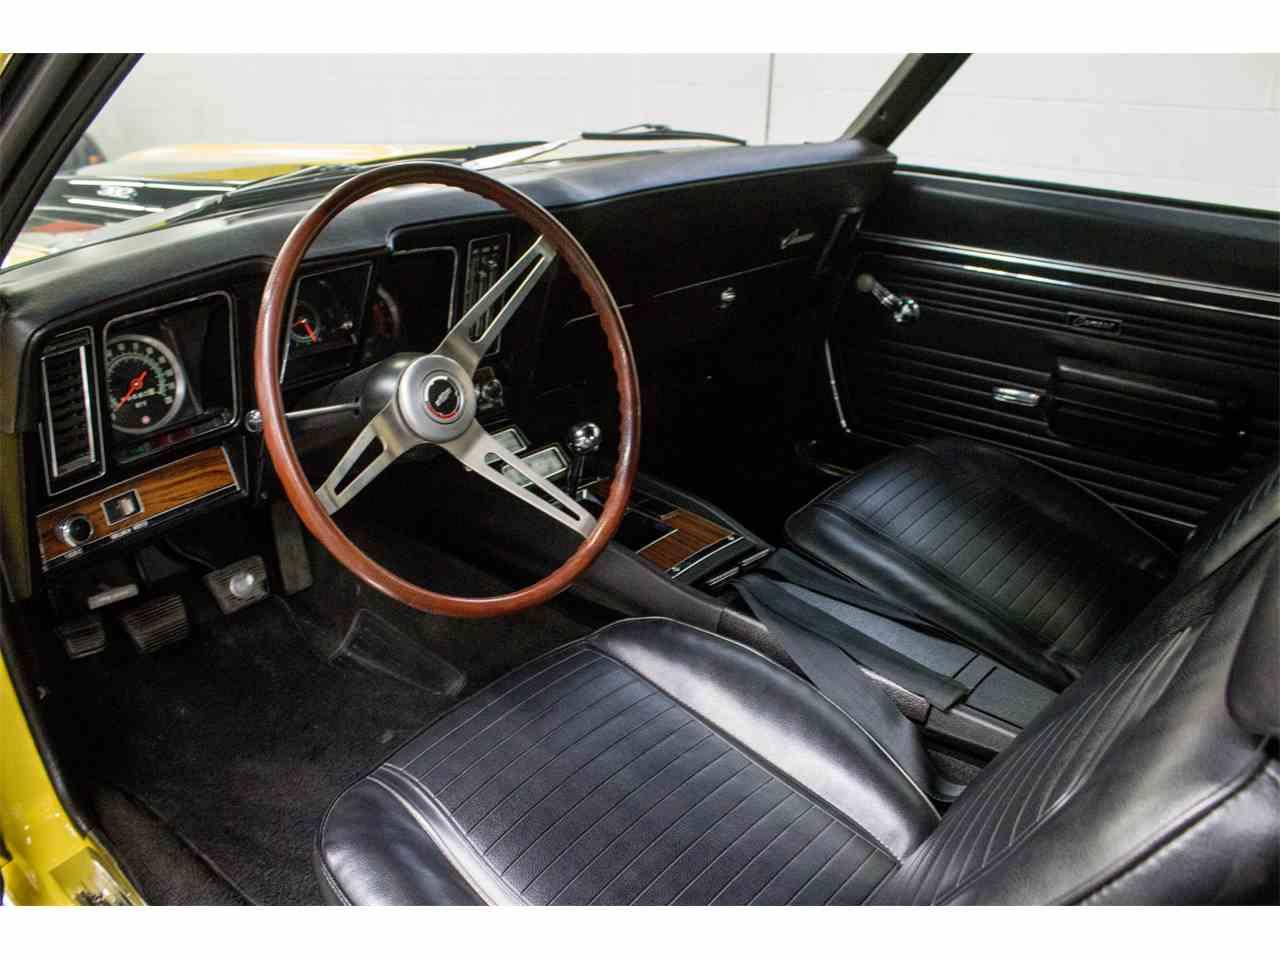 Large Picture of Classic '69 Camaro Z28 - $79,000.00 - M8KS